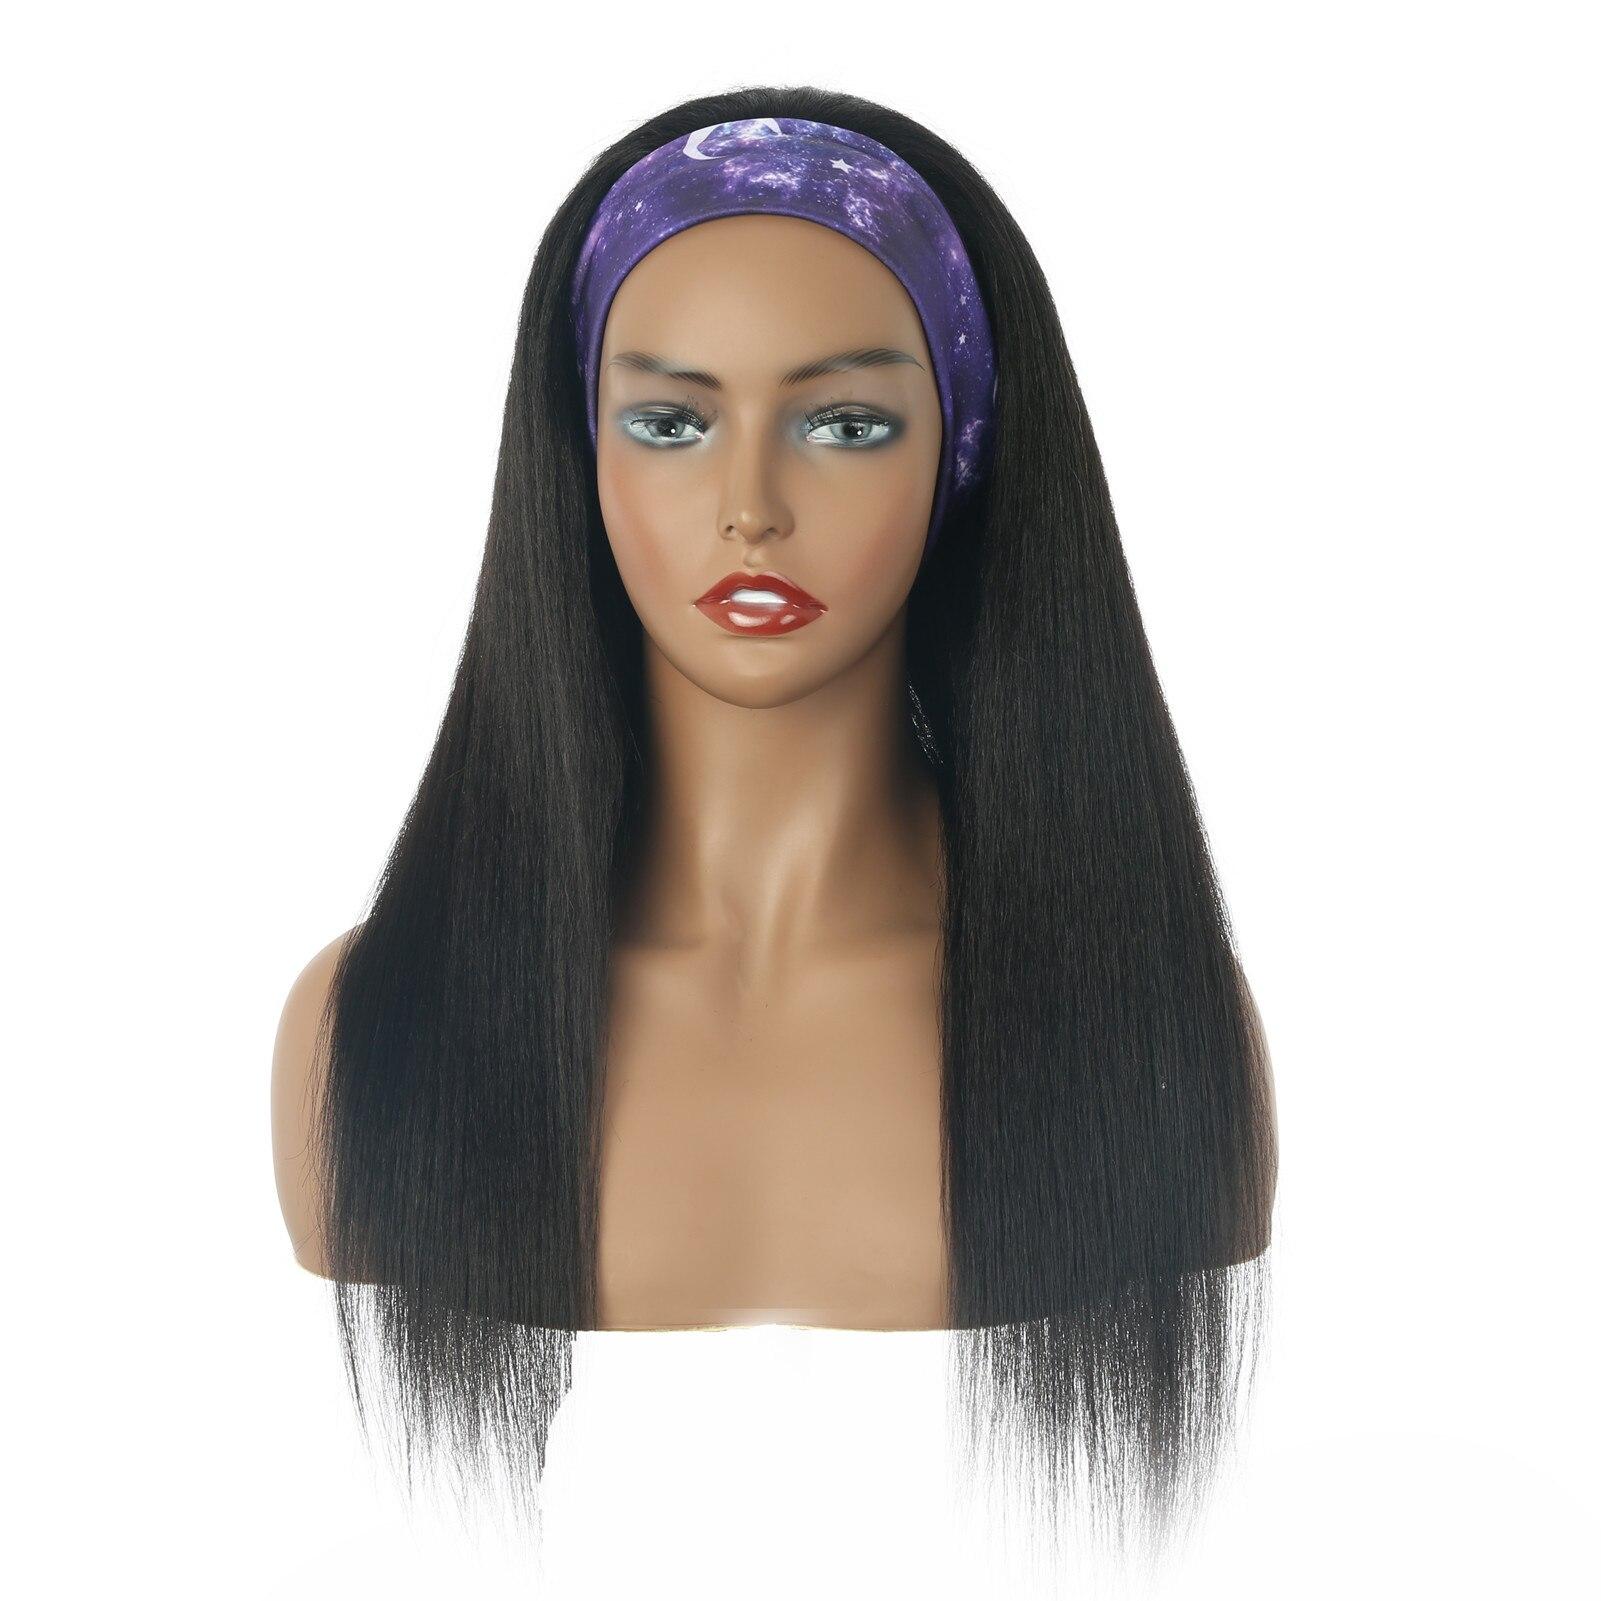 Headband Wig Glueless Yaki Kinky Straight Wig Headband Blend Human Hair Wigs For Women Nature Color Wear and Go 150% Dentiny